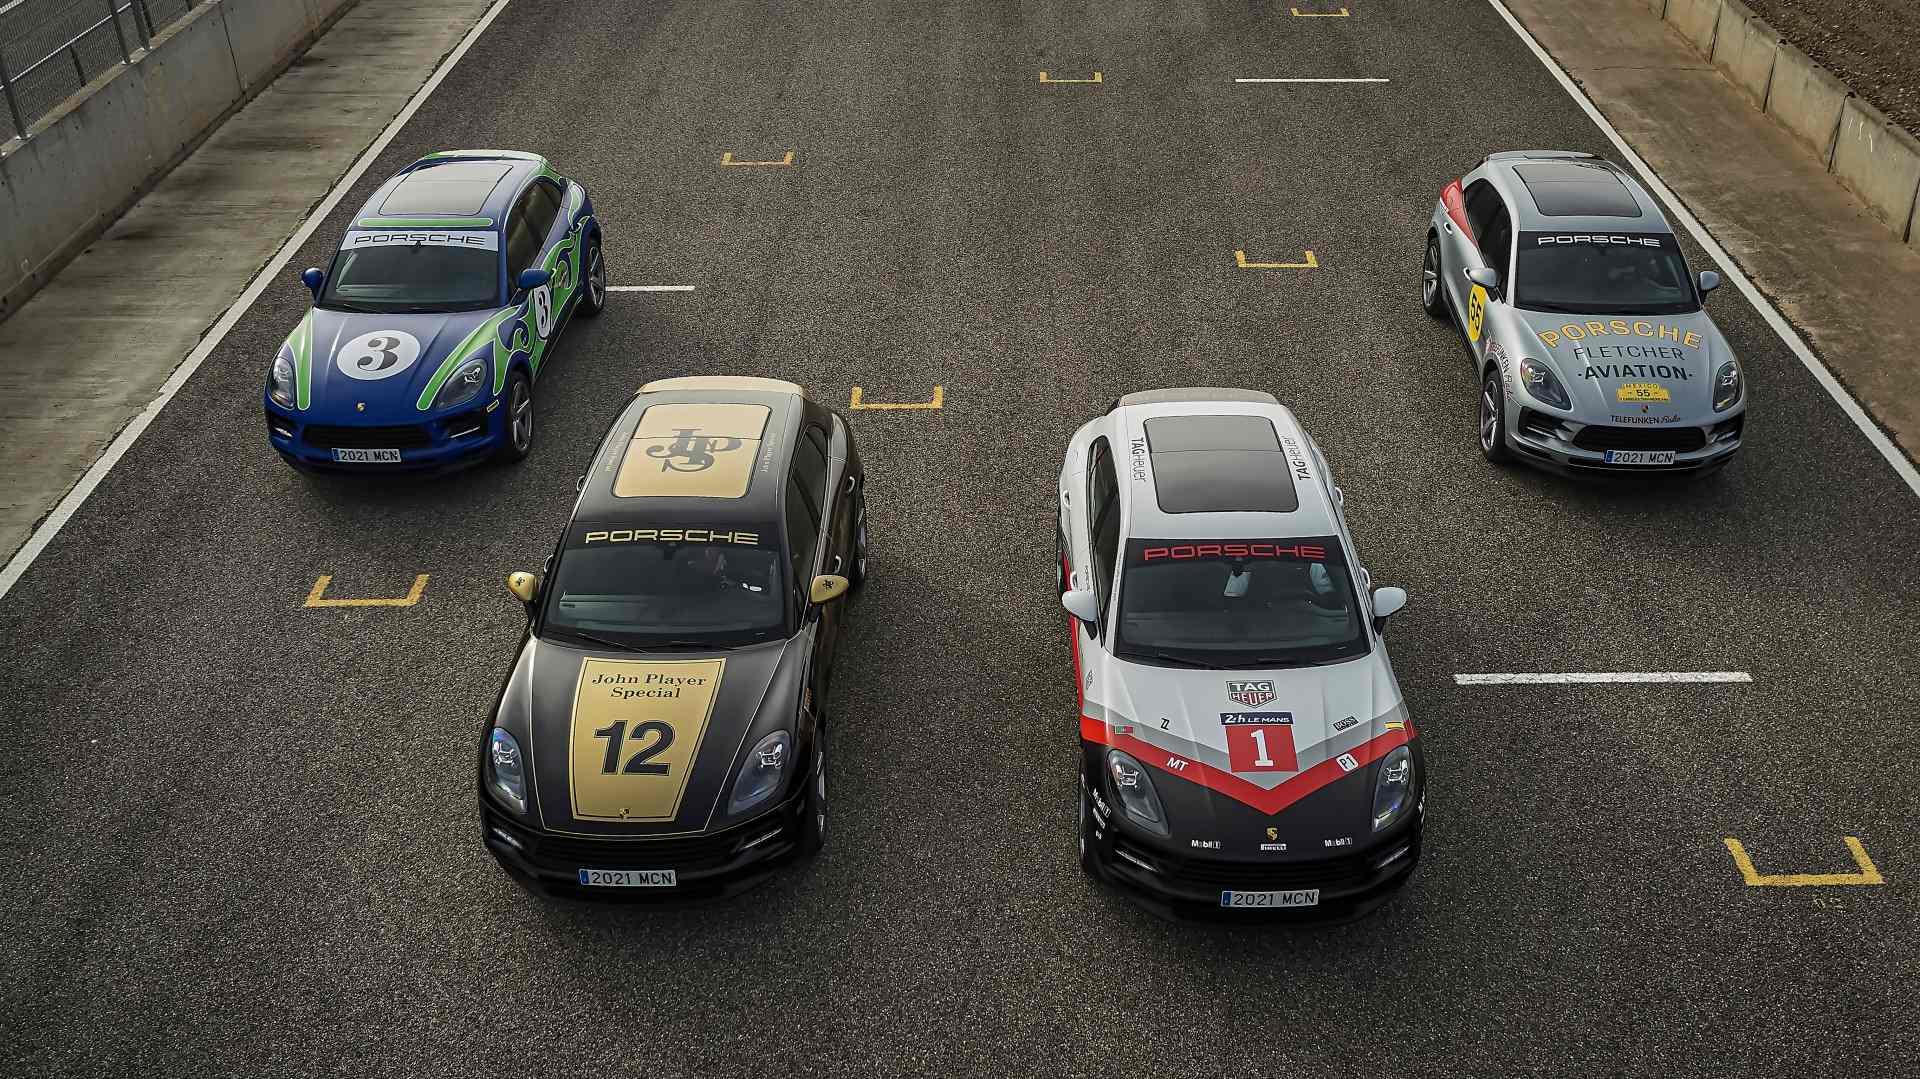 Porsche Macan Tribute 2021, rindiendo homenaje a ilustres coches de competición